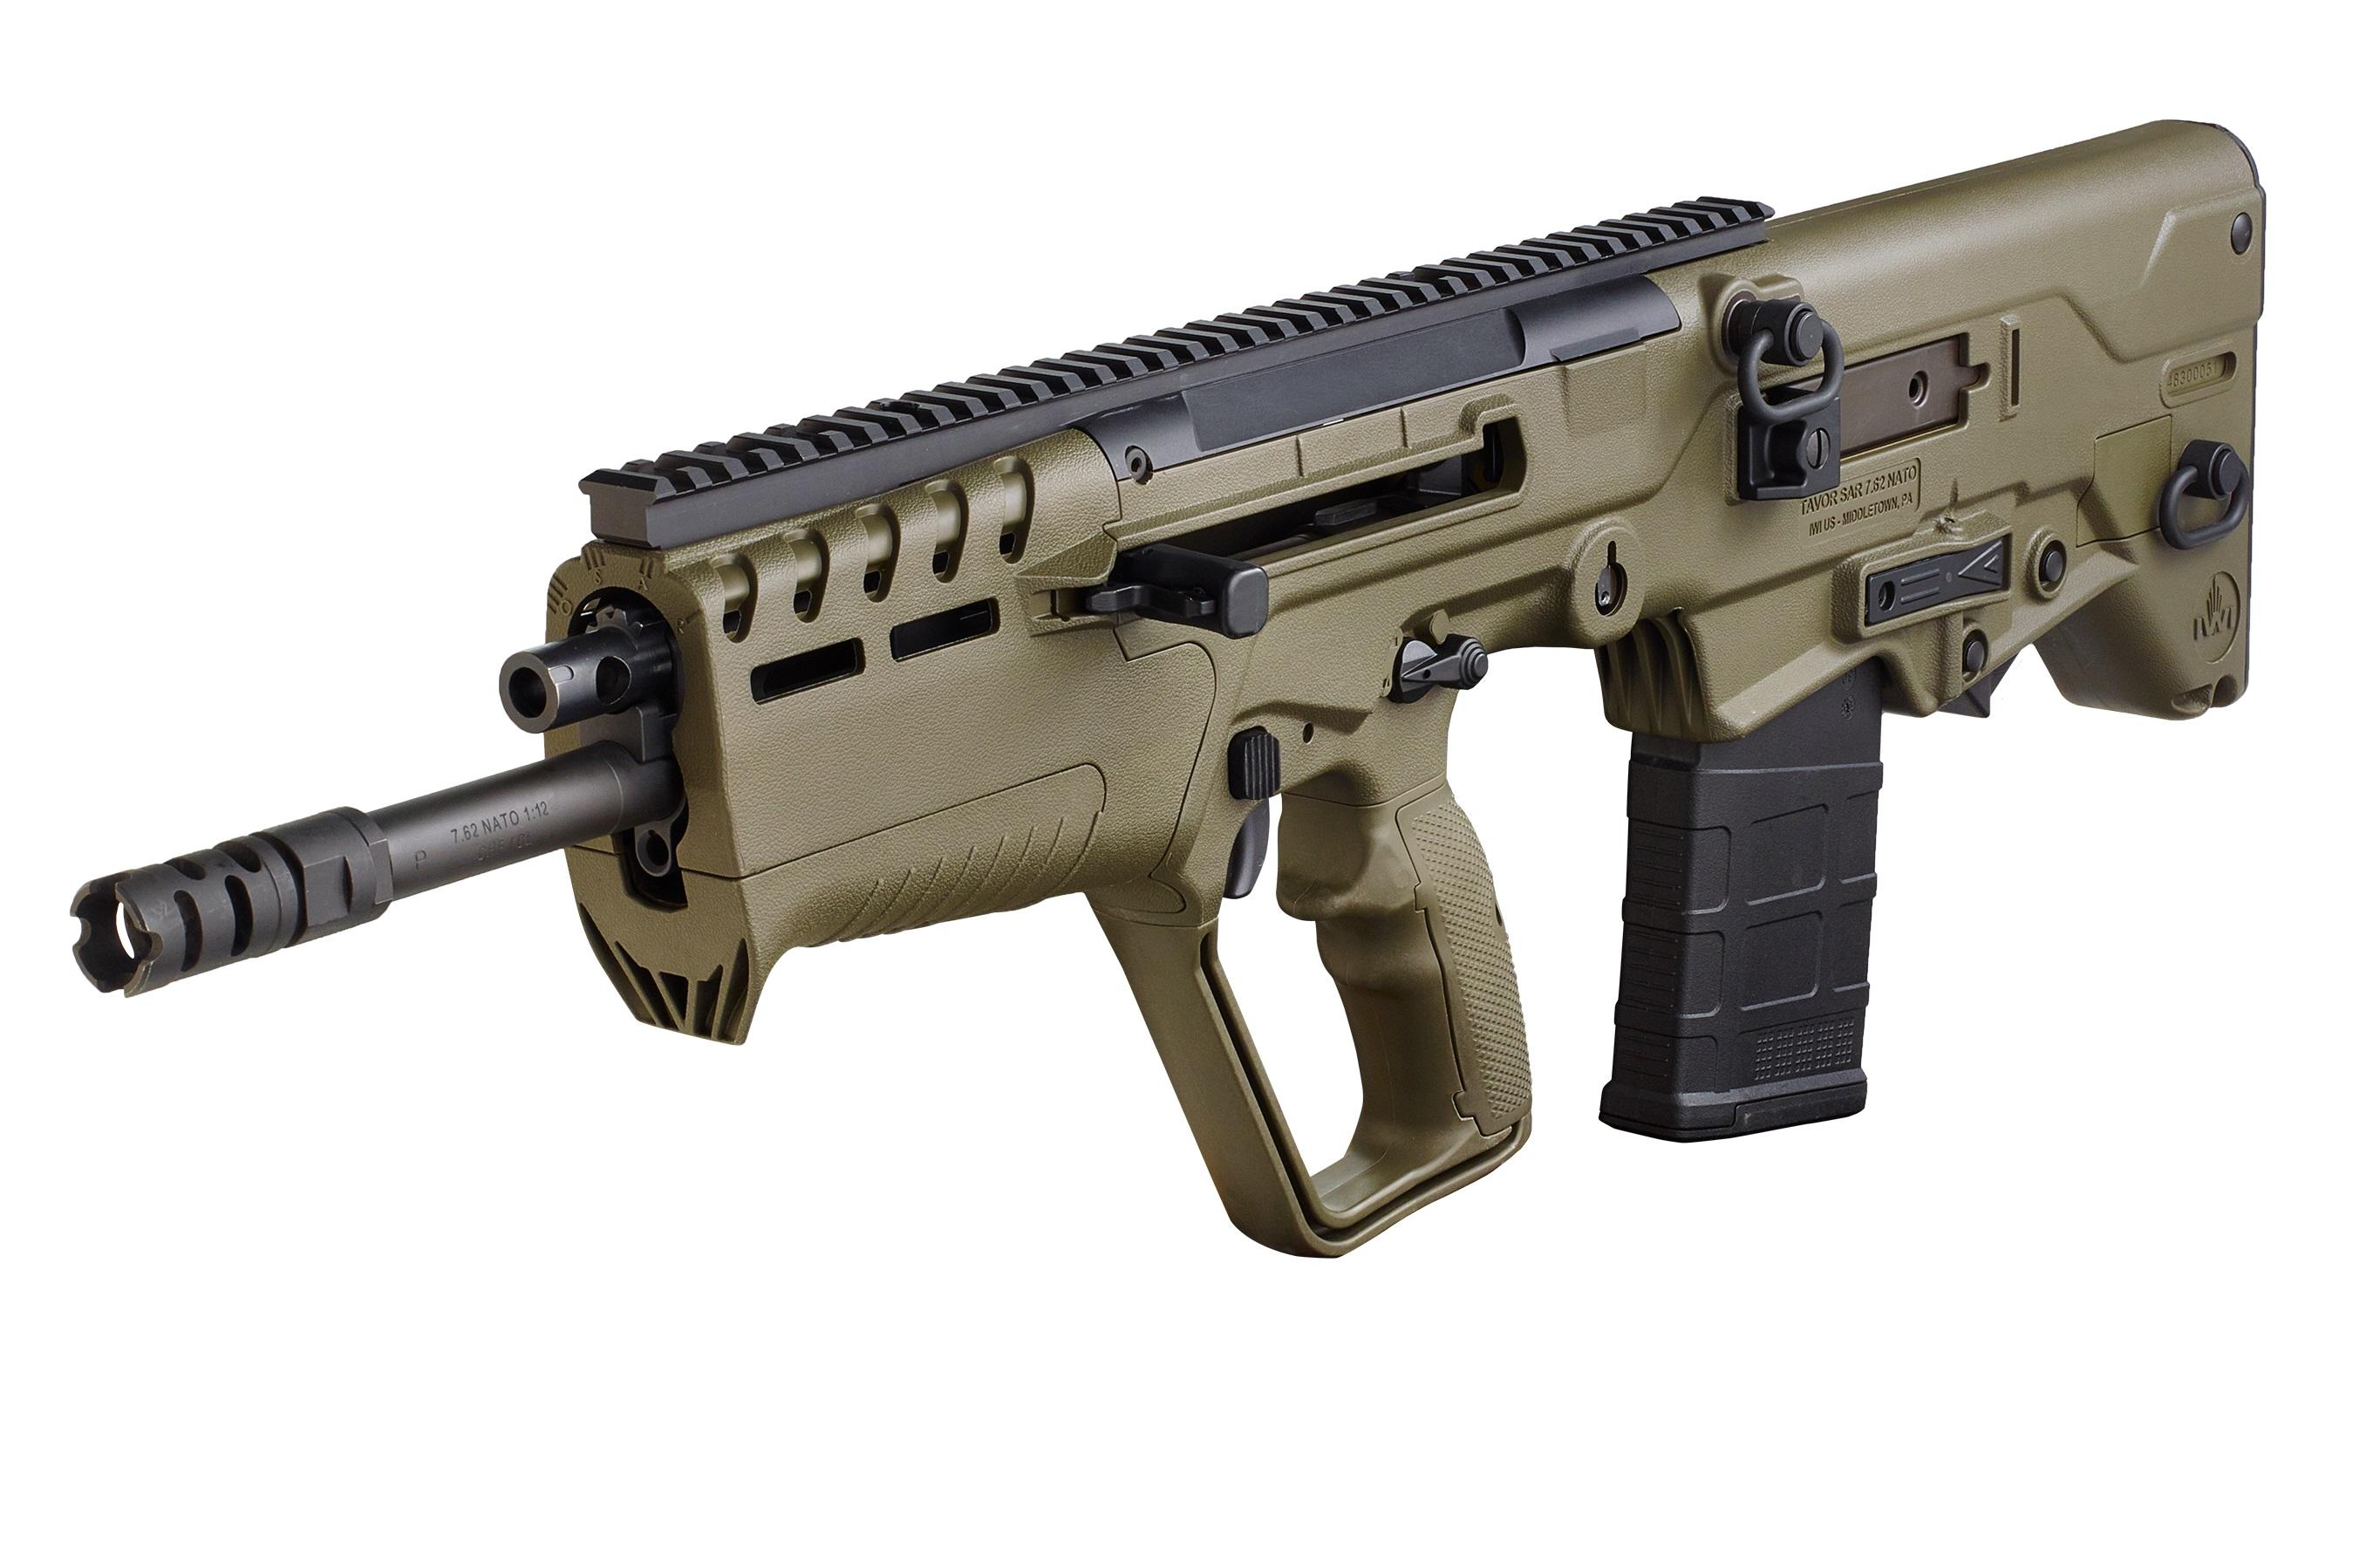 IWI - Israel Weapon Industries Tavor 7 Bullpup 7.62 x 51mm | 308 Win